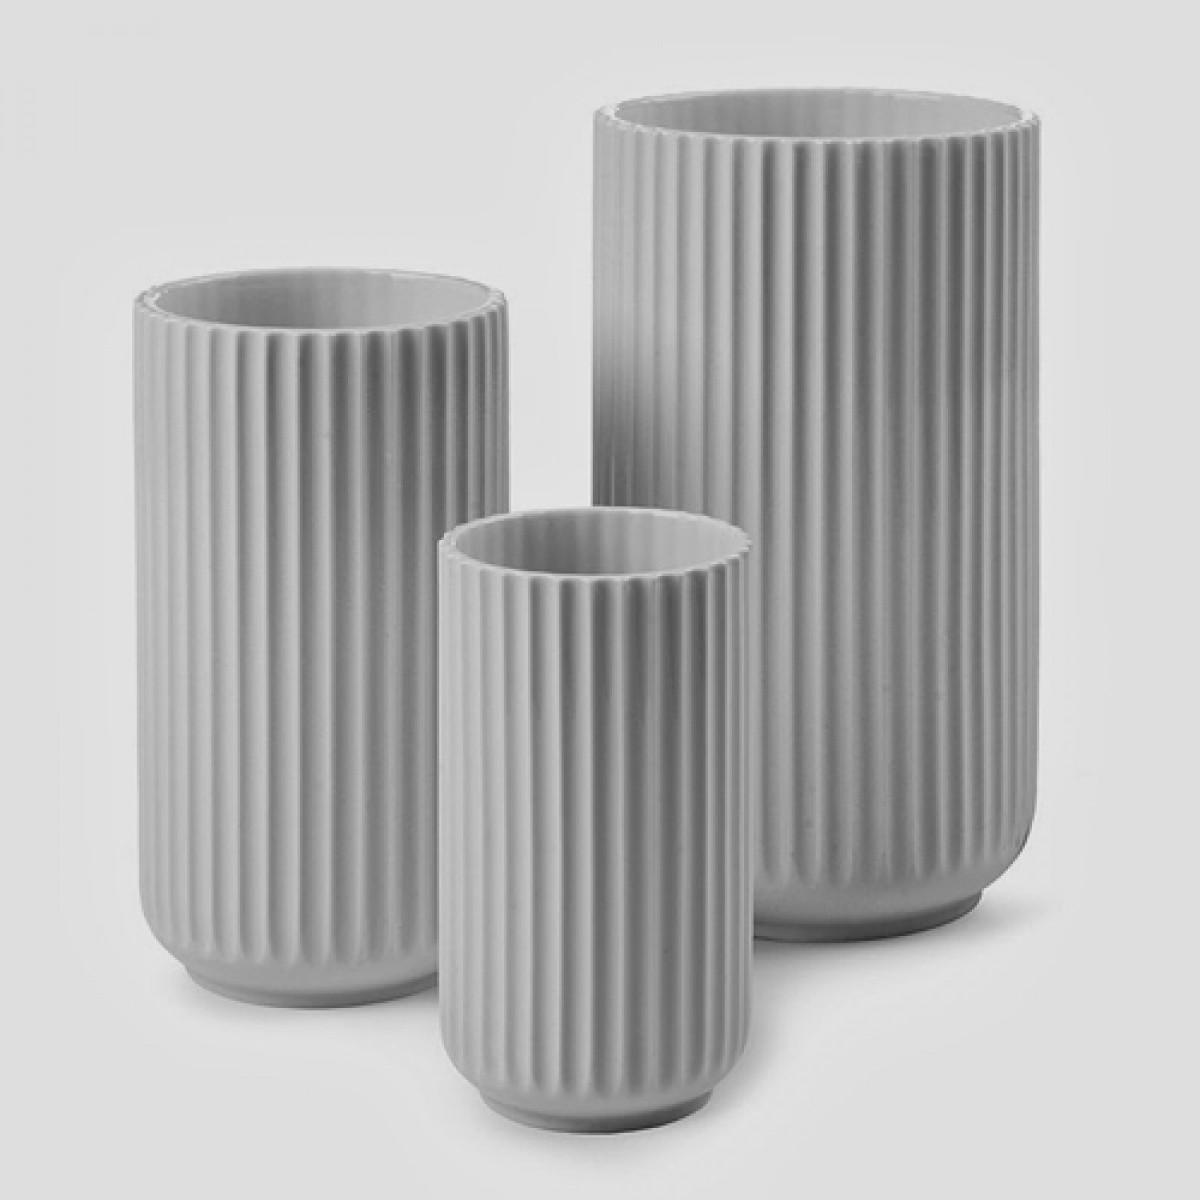 LYNGBY Vasesæt grå 3 stk. 8 + 10 + 12 cm.